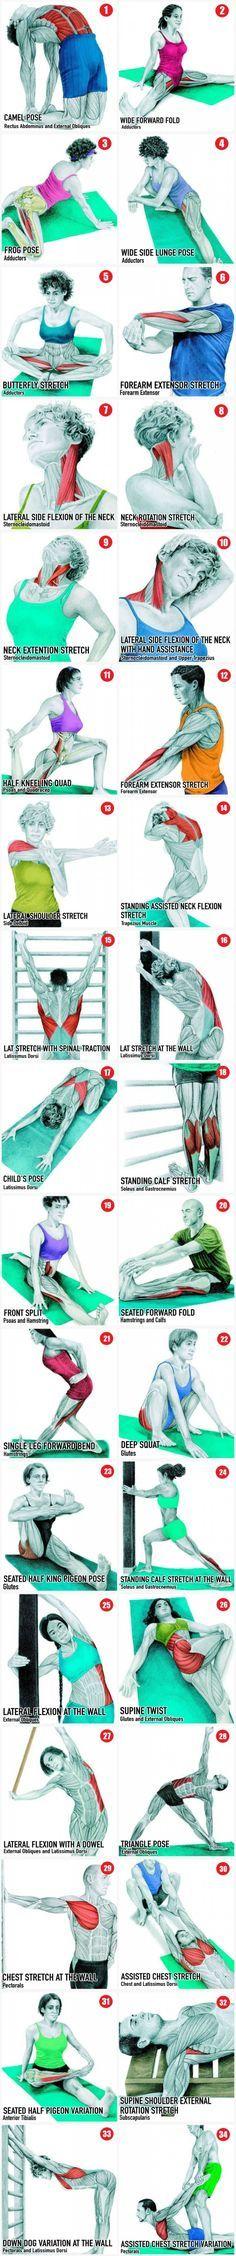 34 Yoga Stretches - Eckermann Fitness